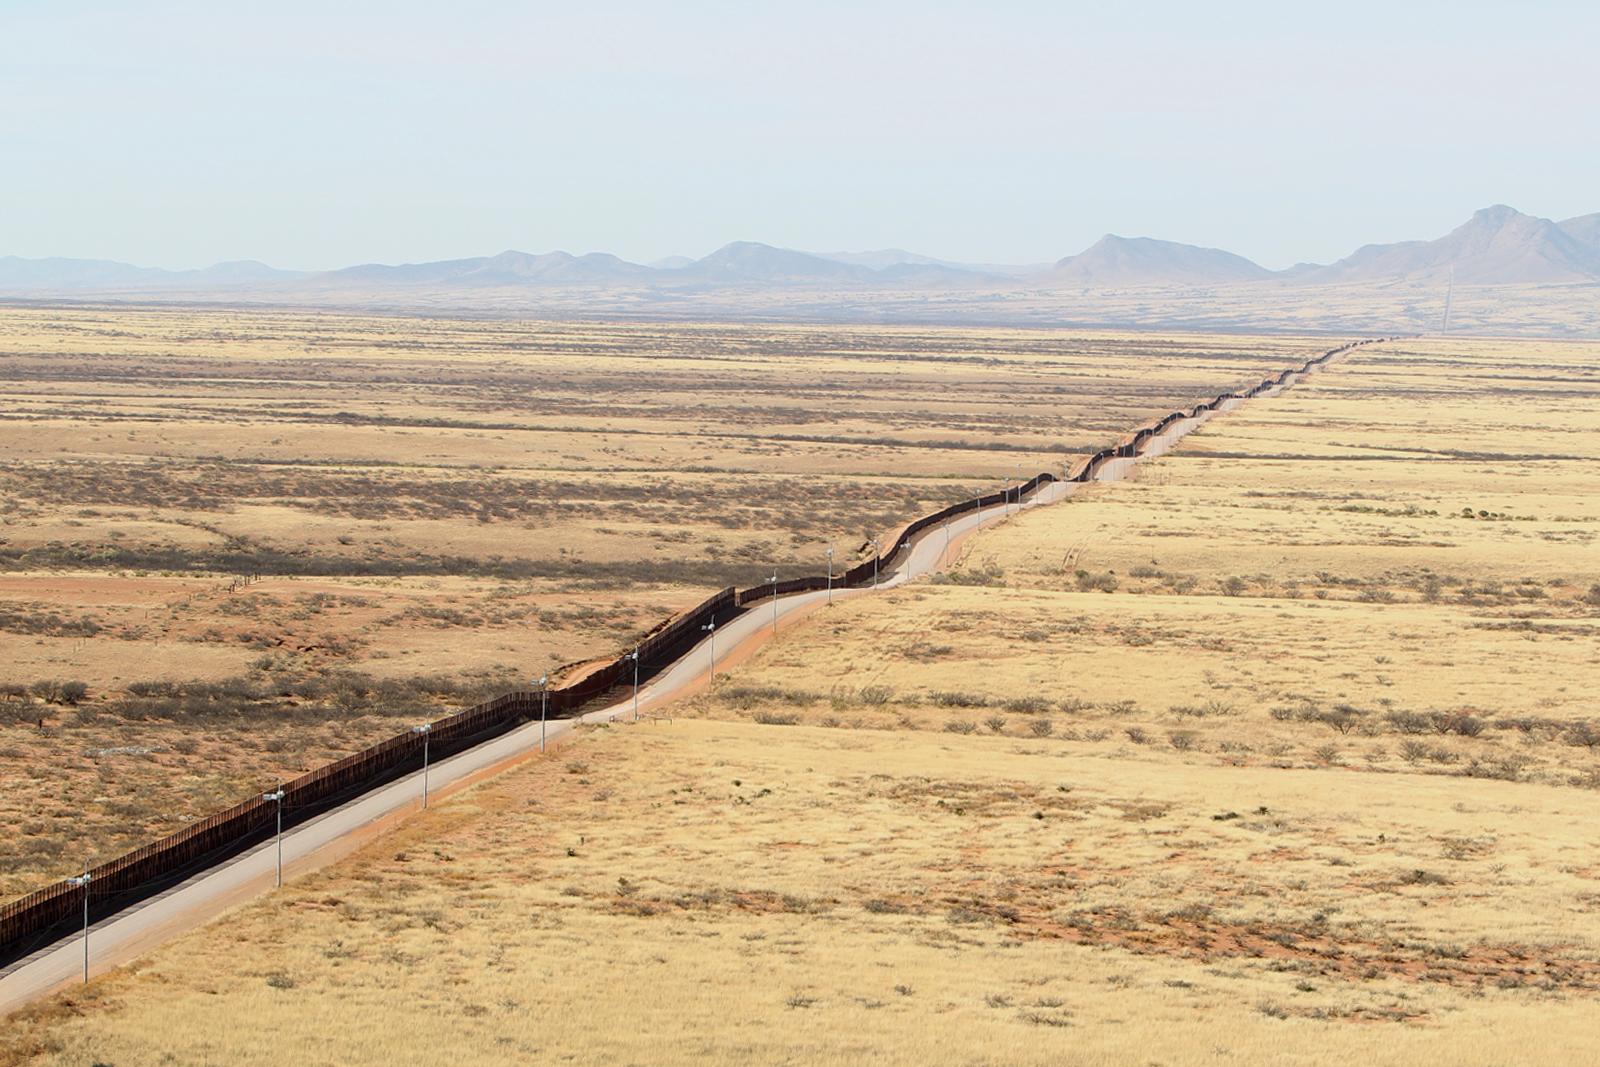 https://upload.wikimedia.org/wikipedia/commons/1/1b/U.S._Customs_%26_Border_Protection_Southwest_Border_Arizona_Fence_Line_%288510182328%29.jpg